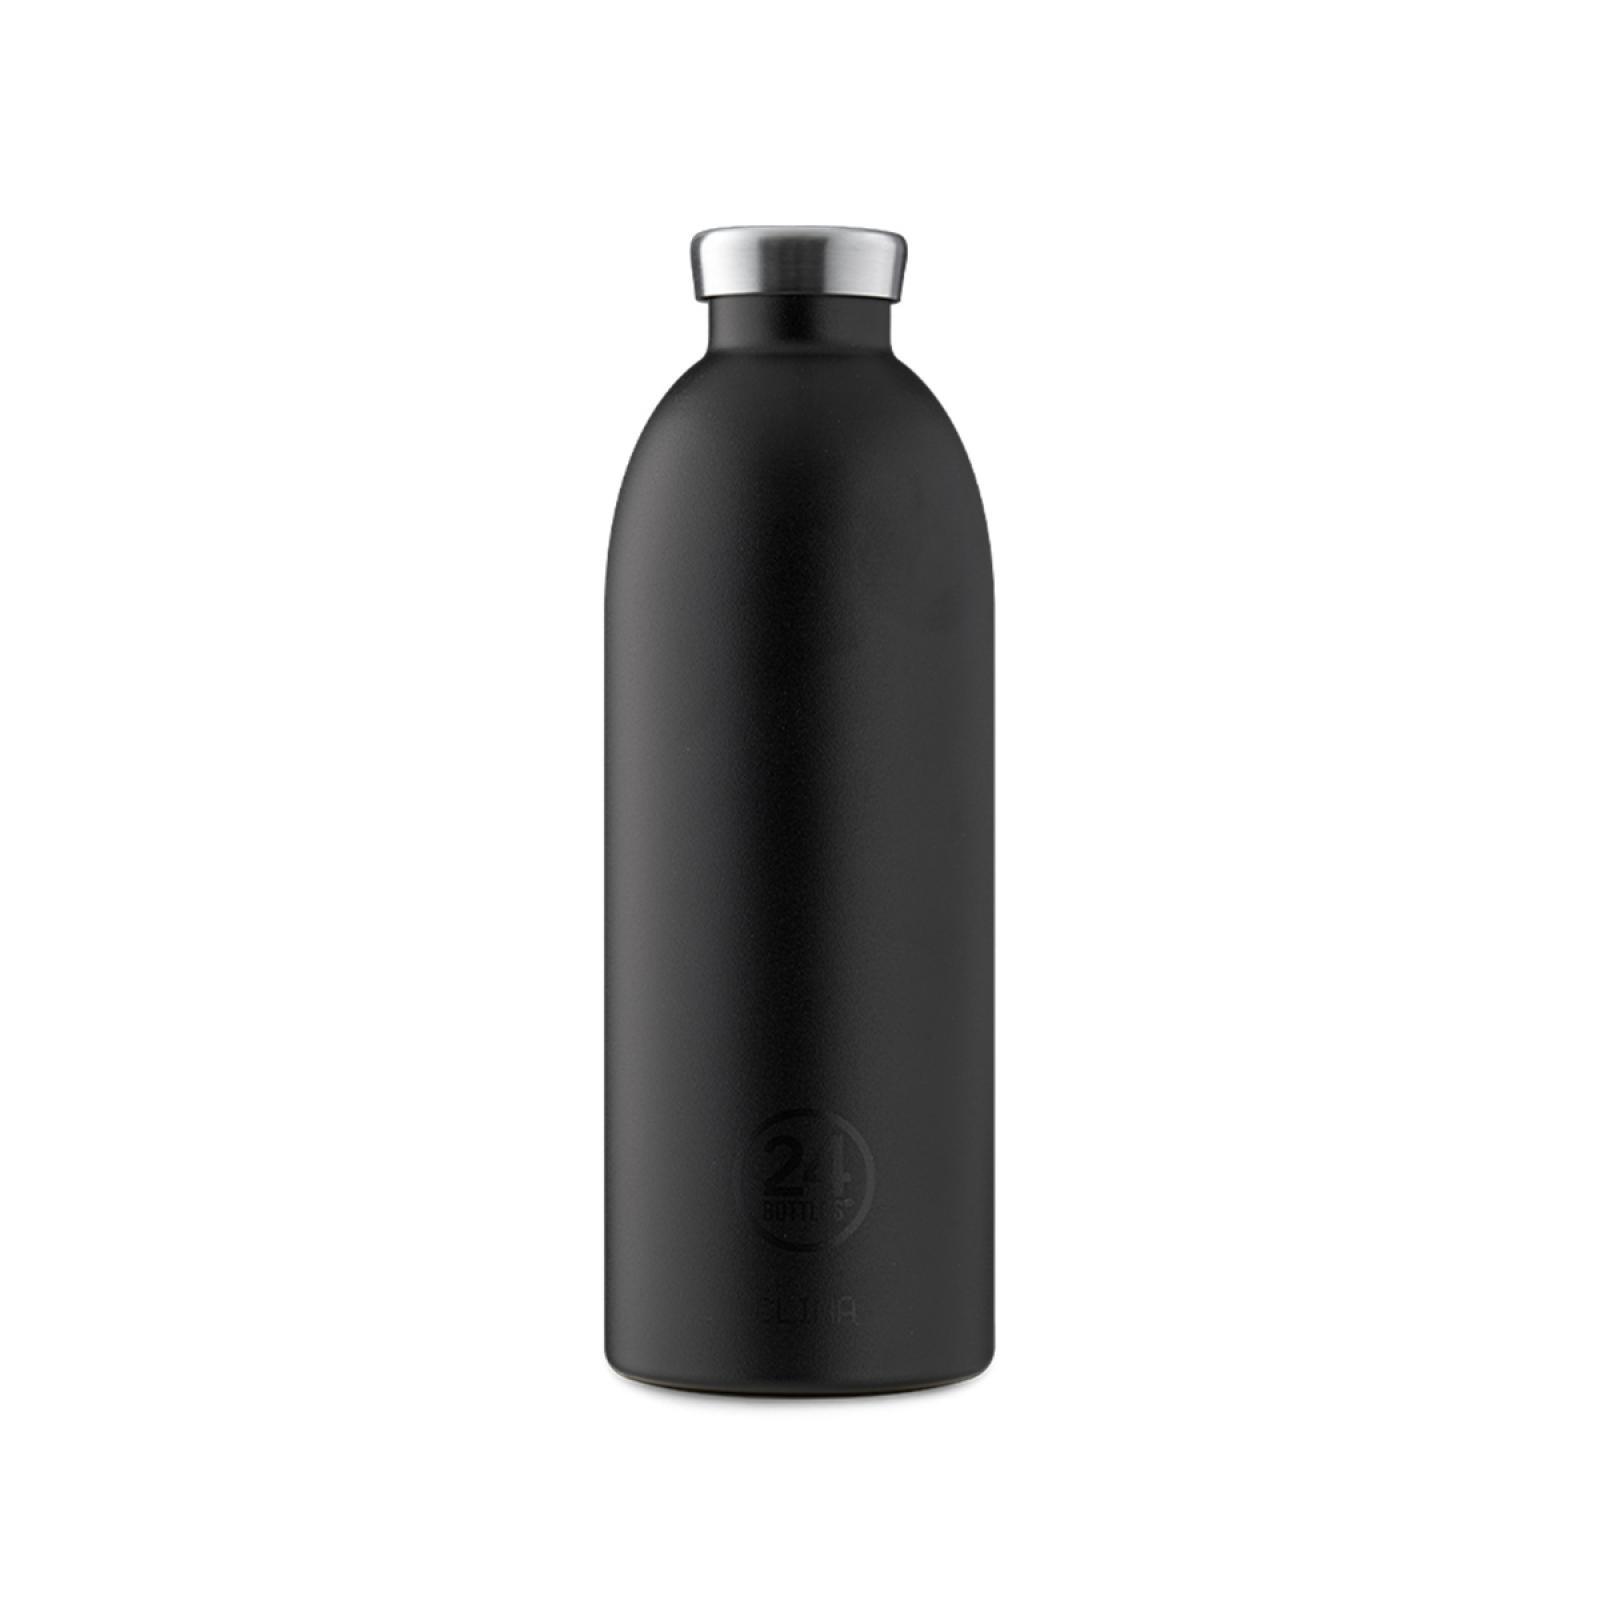 24 Bottles Clima Tuxedo Balck 850 ml - 1